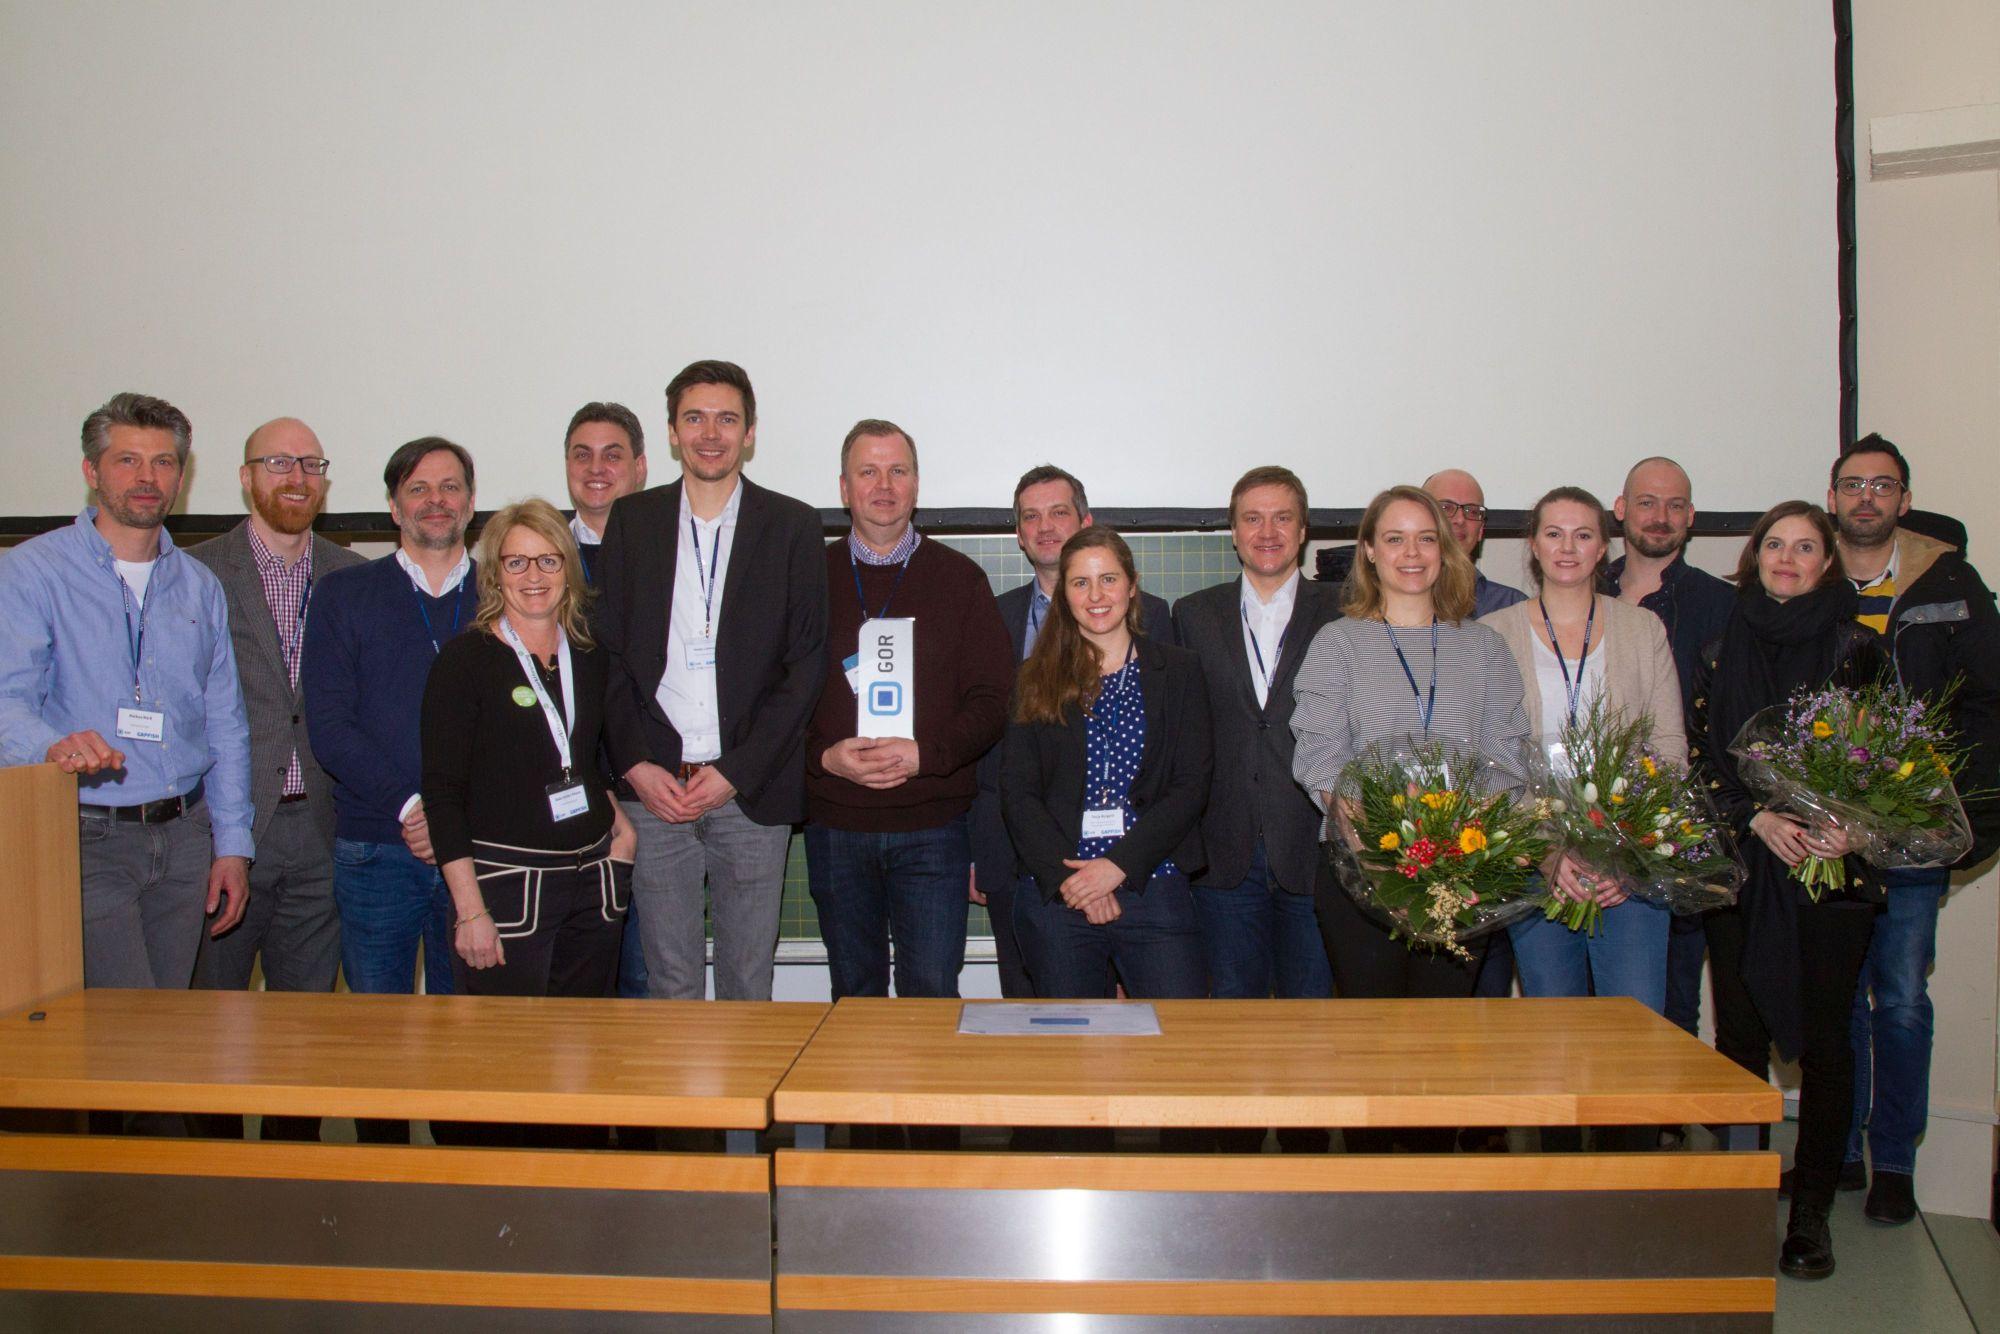 GOR 19 Award Gewinner - Copyright: Simon Westphal